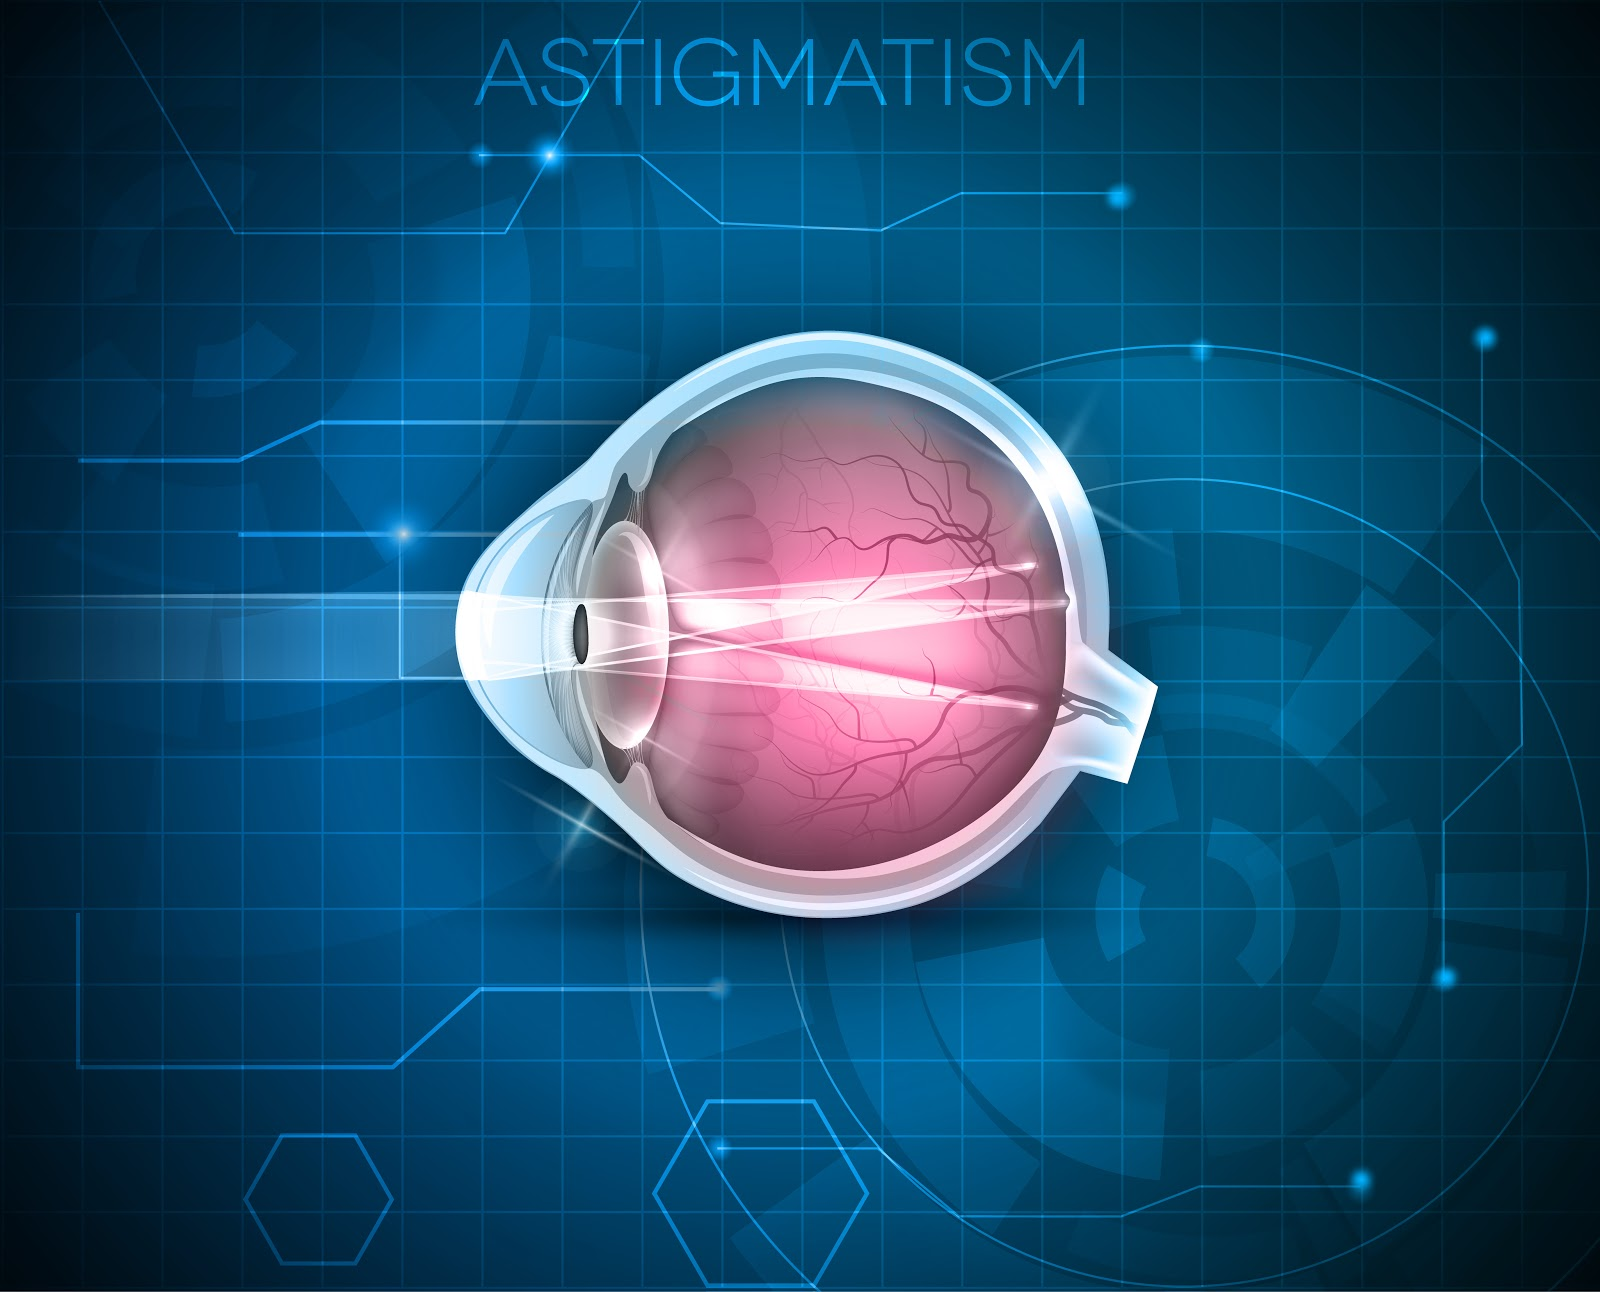 vedere in cazul astigmatismului